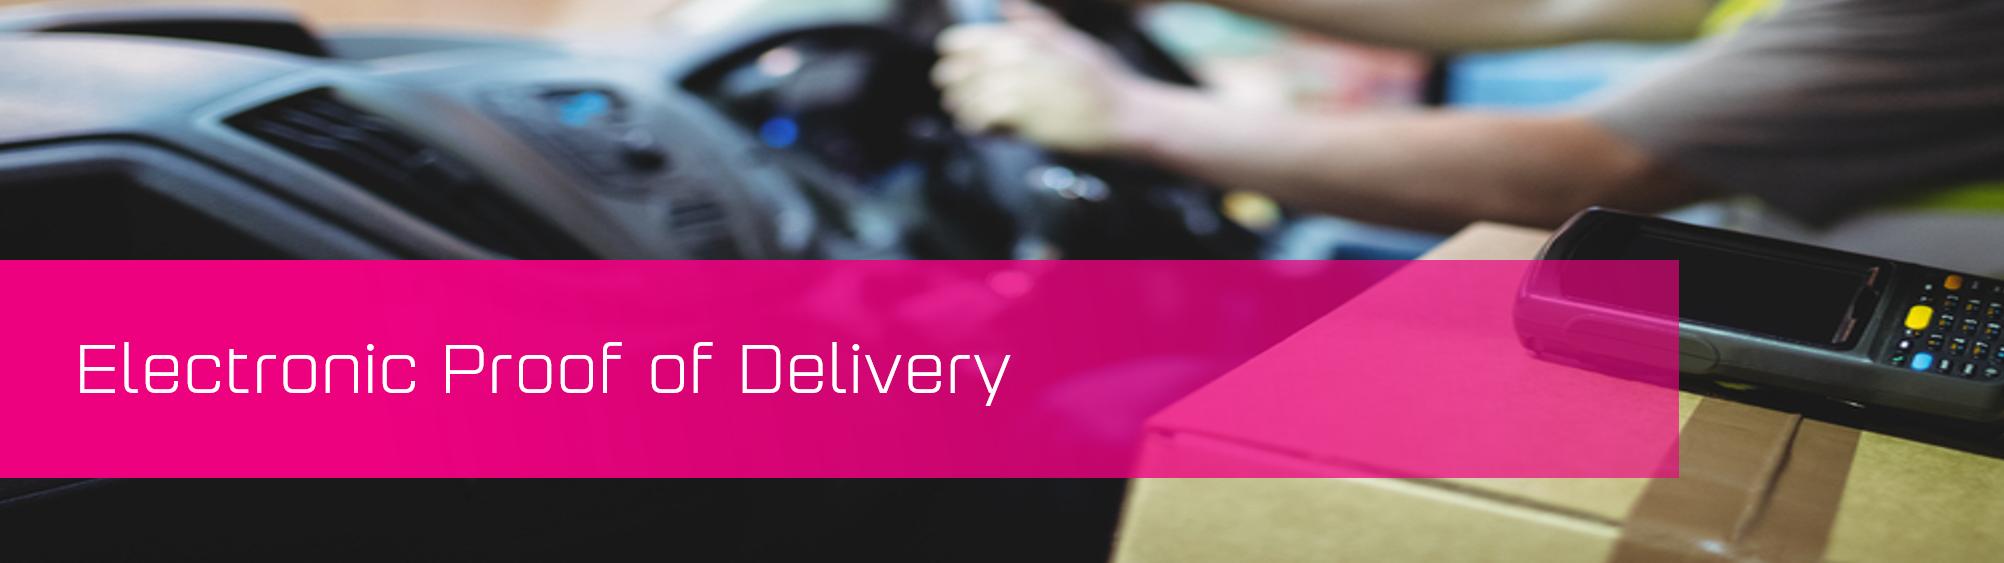 KCS SA - Blog - Electronic Proof of Delivery